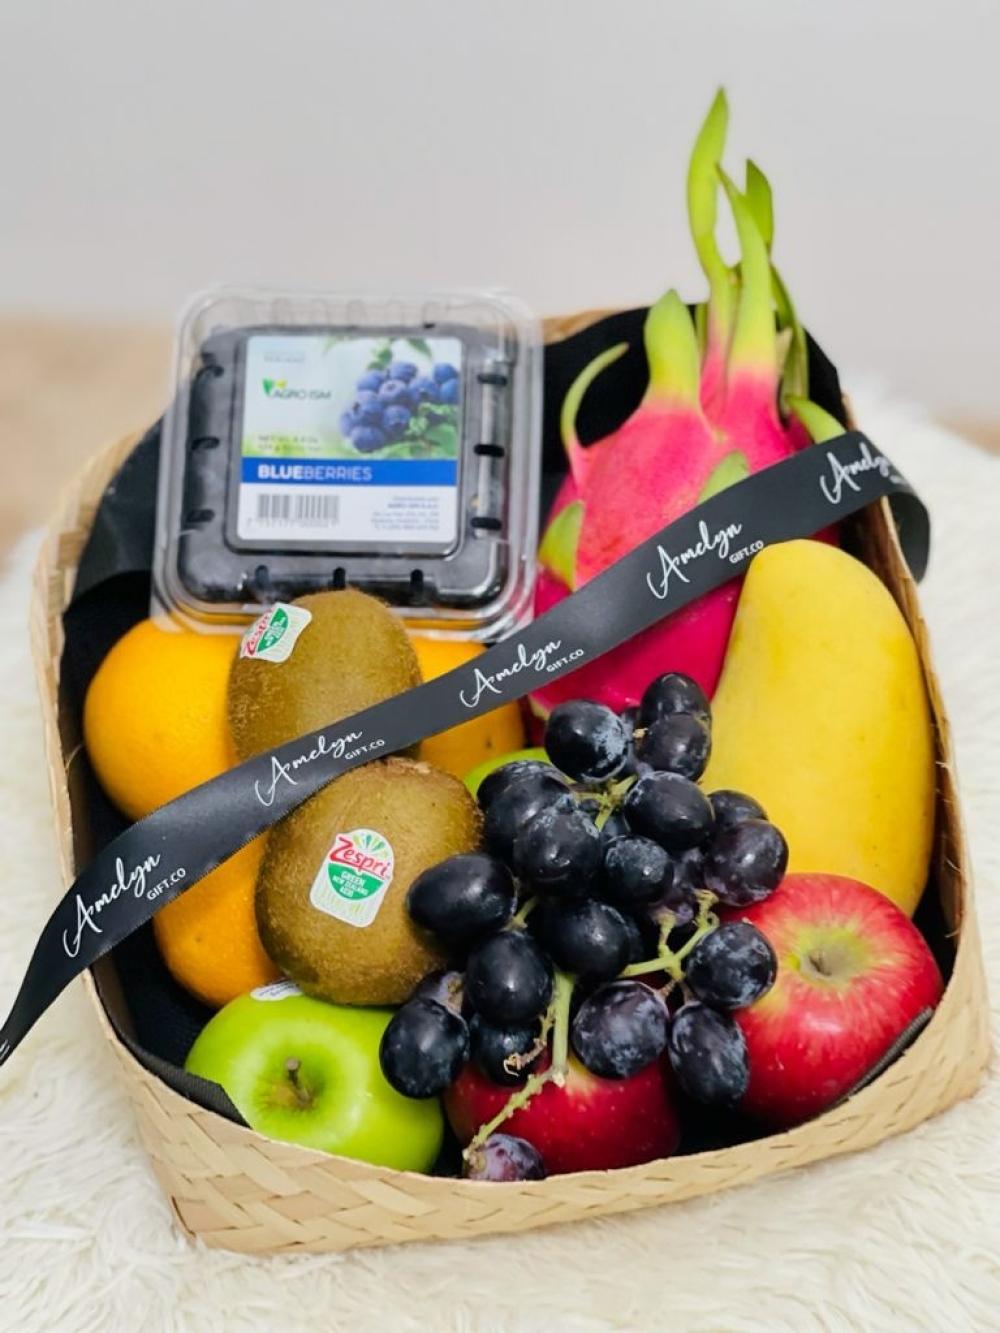 Rainbow Vitamin Fruits with Handmade Rattan Basket